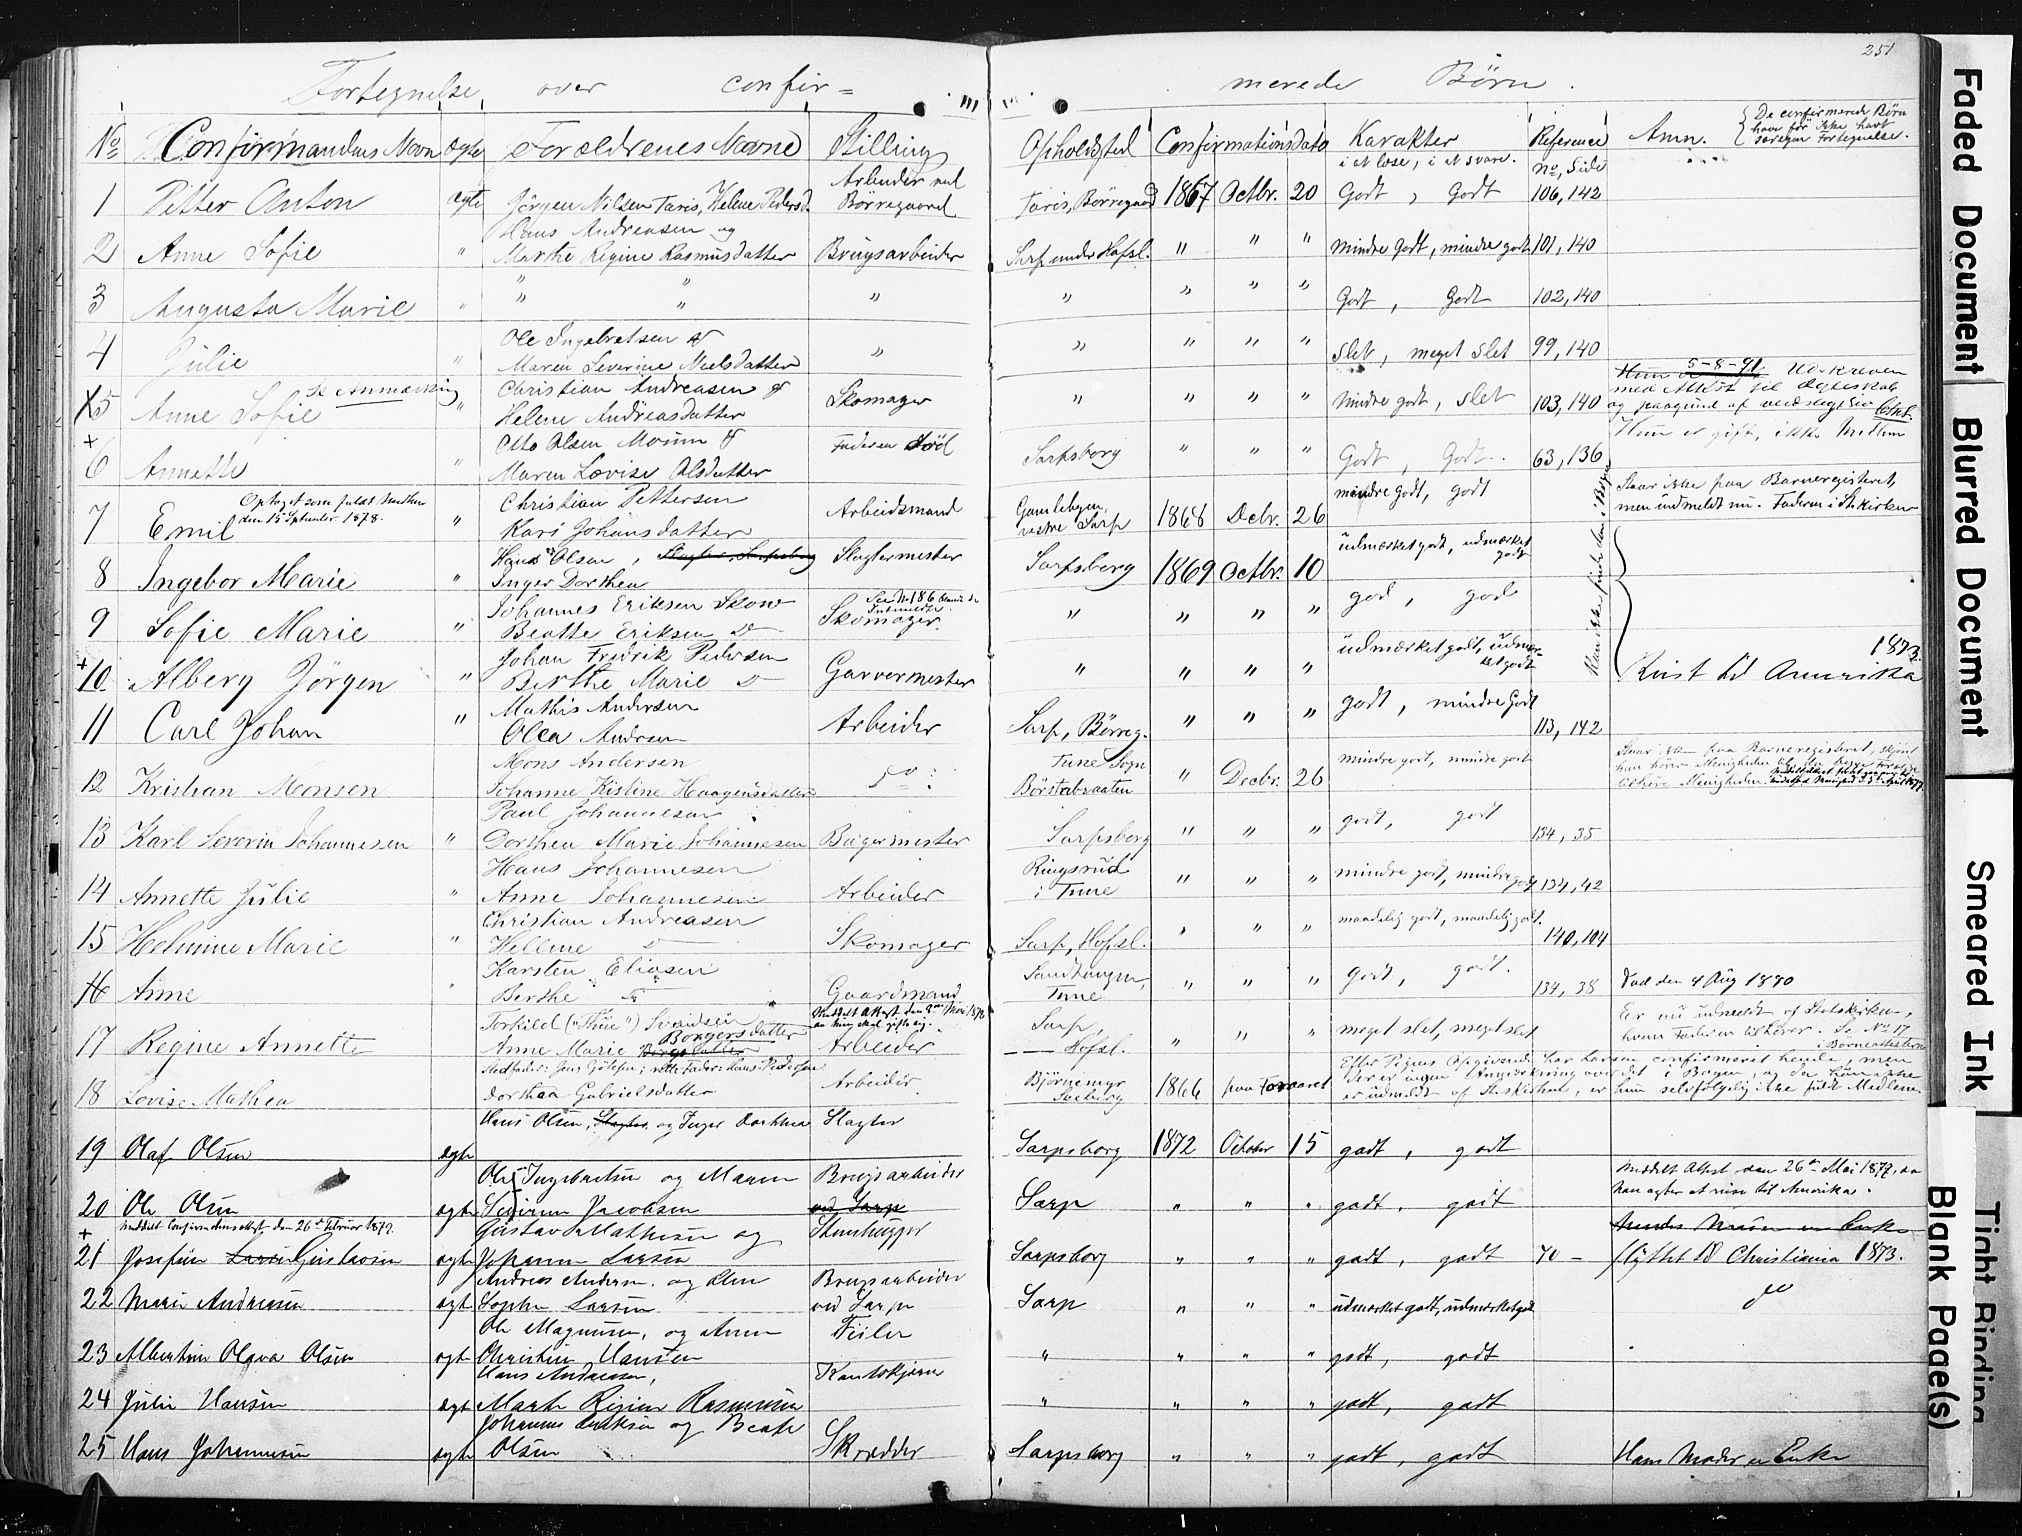 SAO, Sarpsborg metodistkirke, A/L0001: Dissenterprotokoll nr. 1, 1856-1875, s. 251